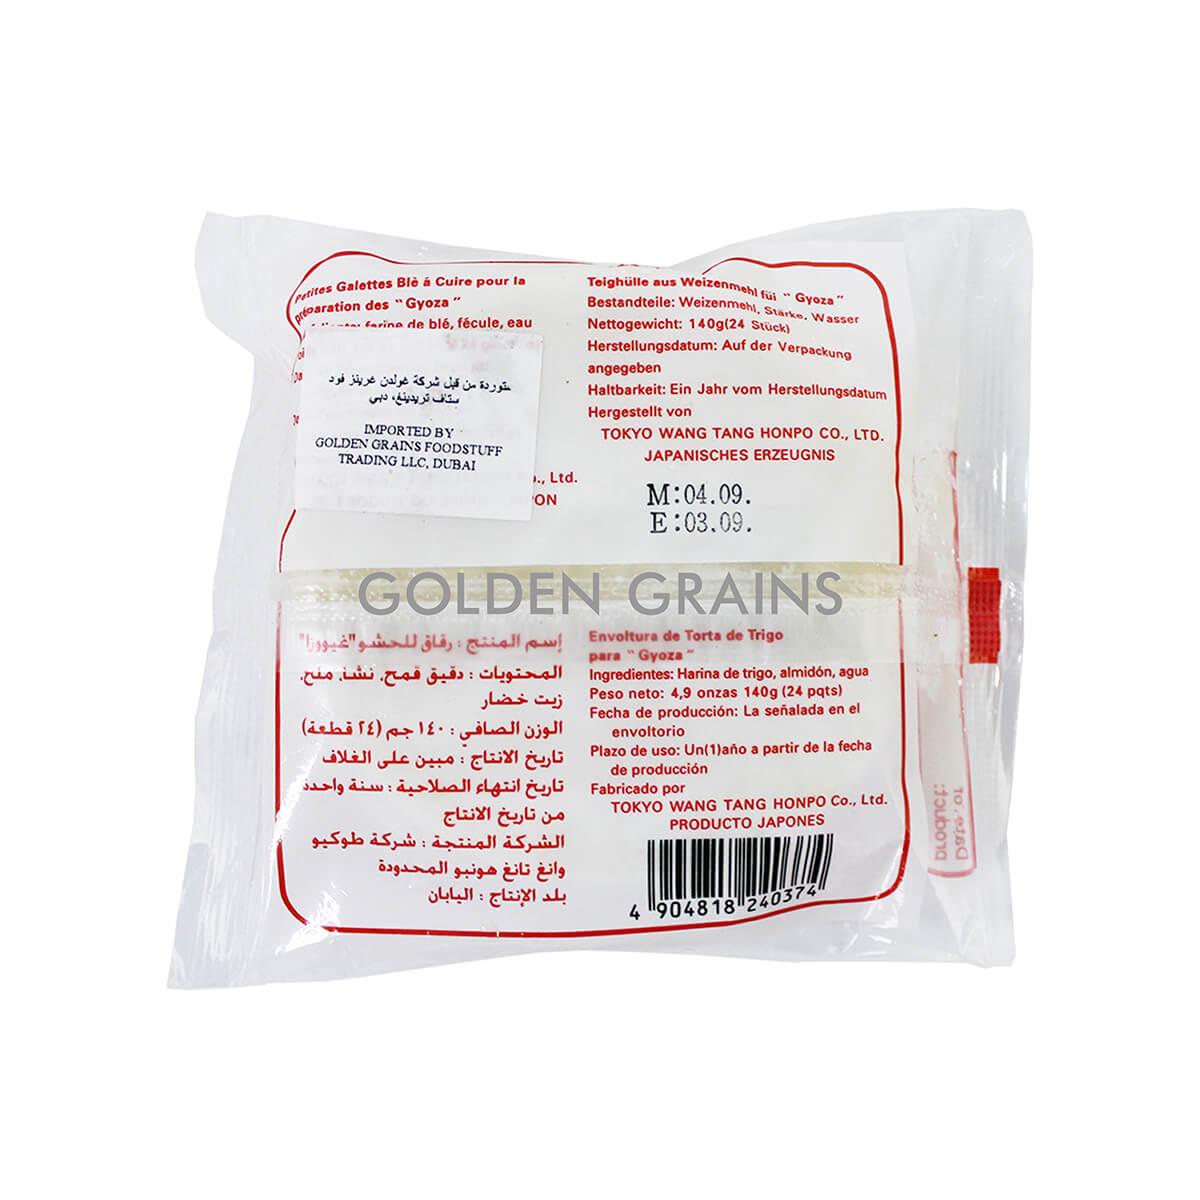 Golden Grains Tokyo - Gyoza No Kawa - 140G - Japan - Back.jpg